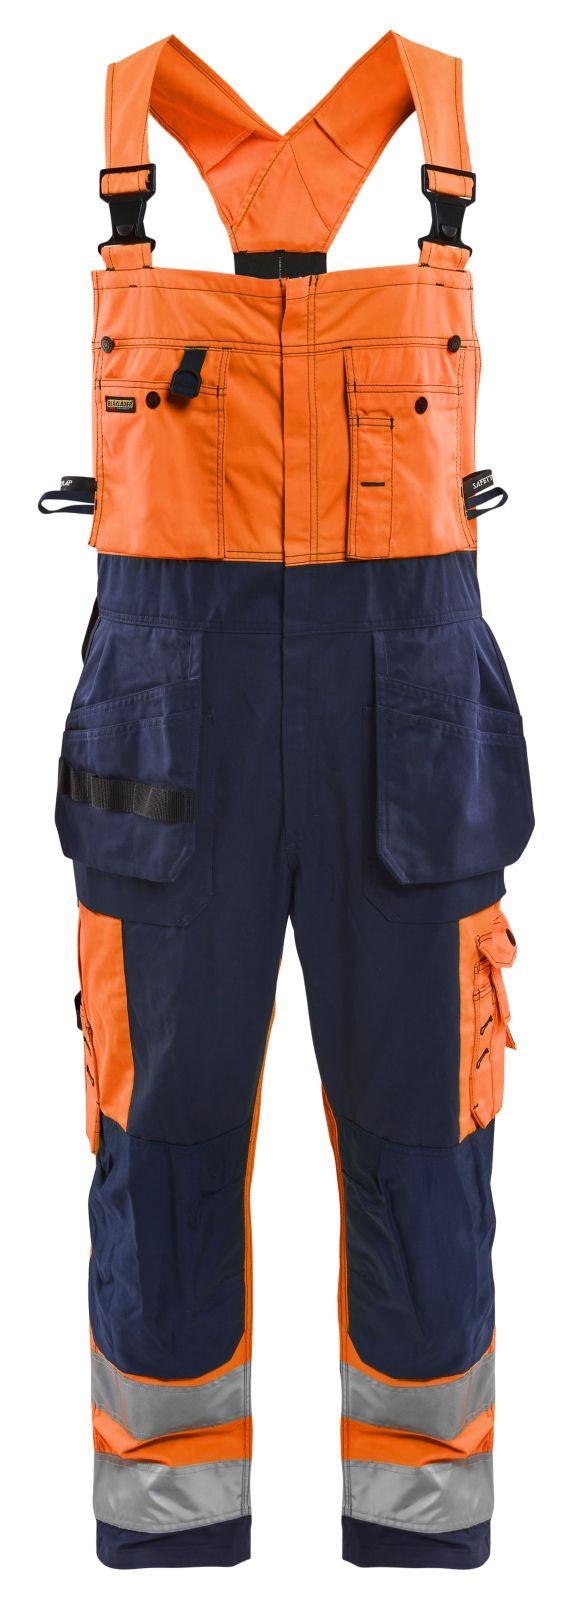 Blaklader Am. Overalls 26031860 High Vis oranje-marineblauw(5389)